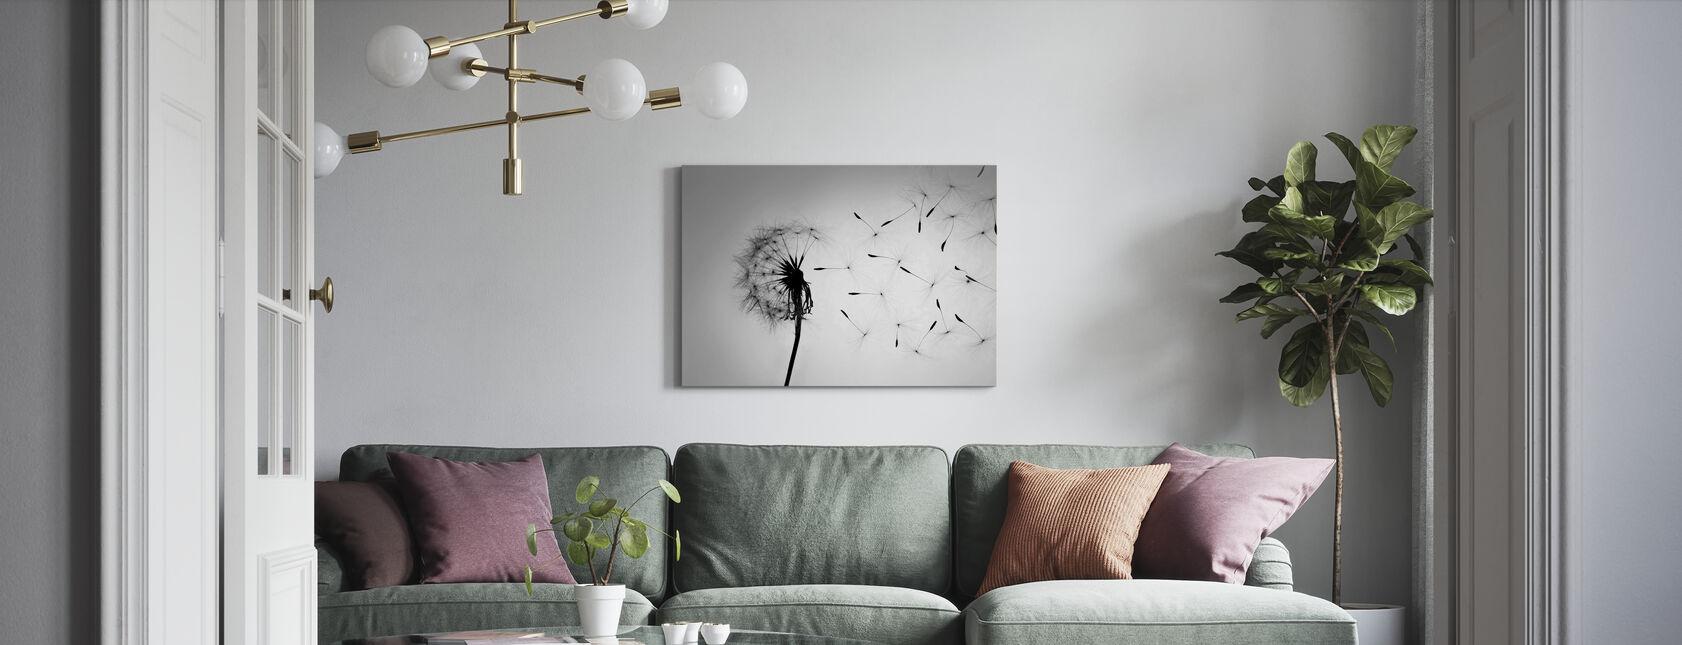 Dandelion - Black White - Canvas print - Living Room